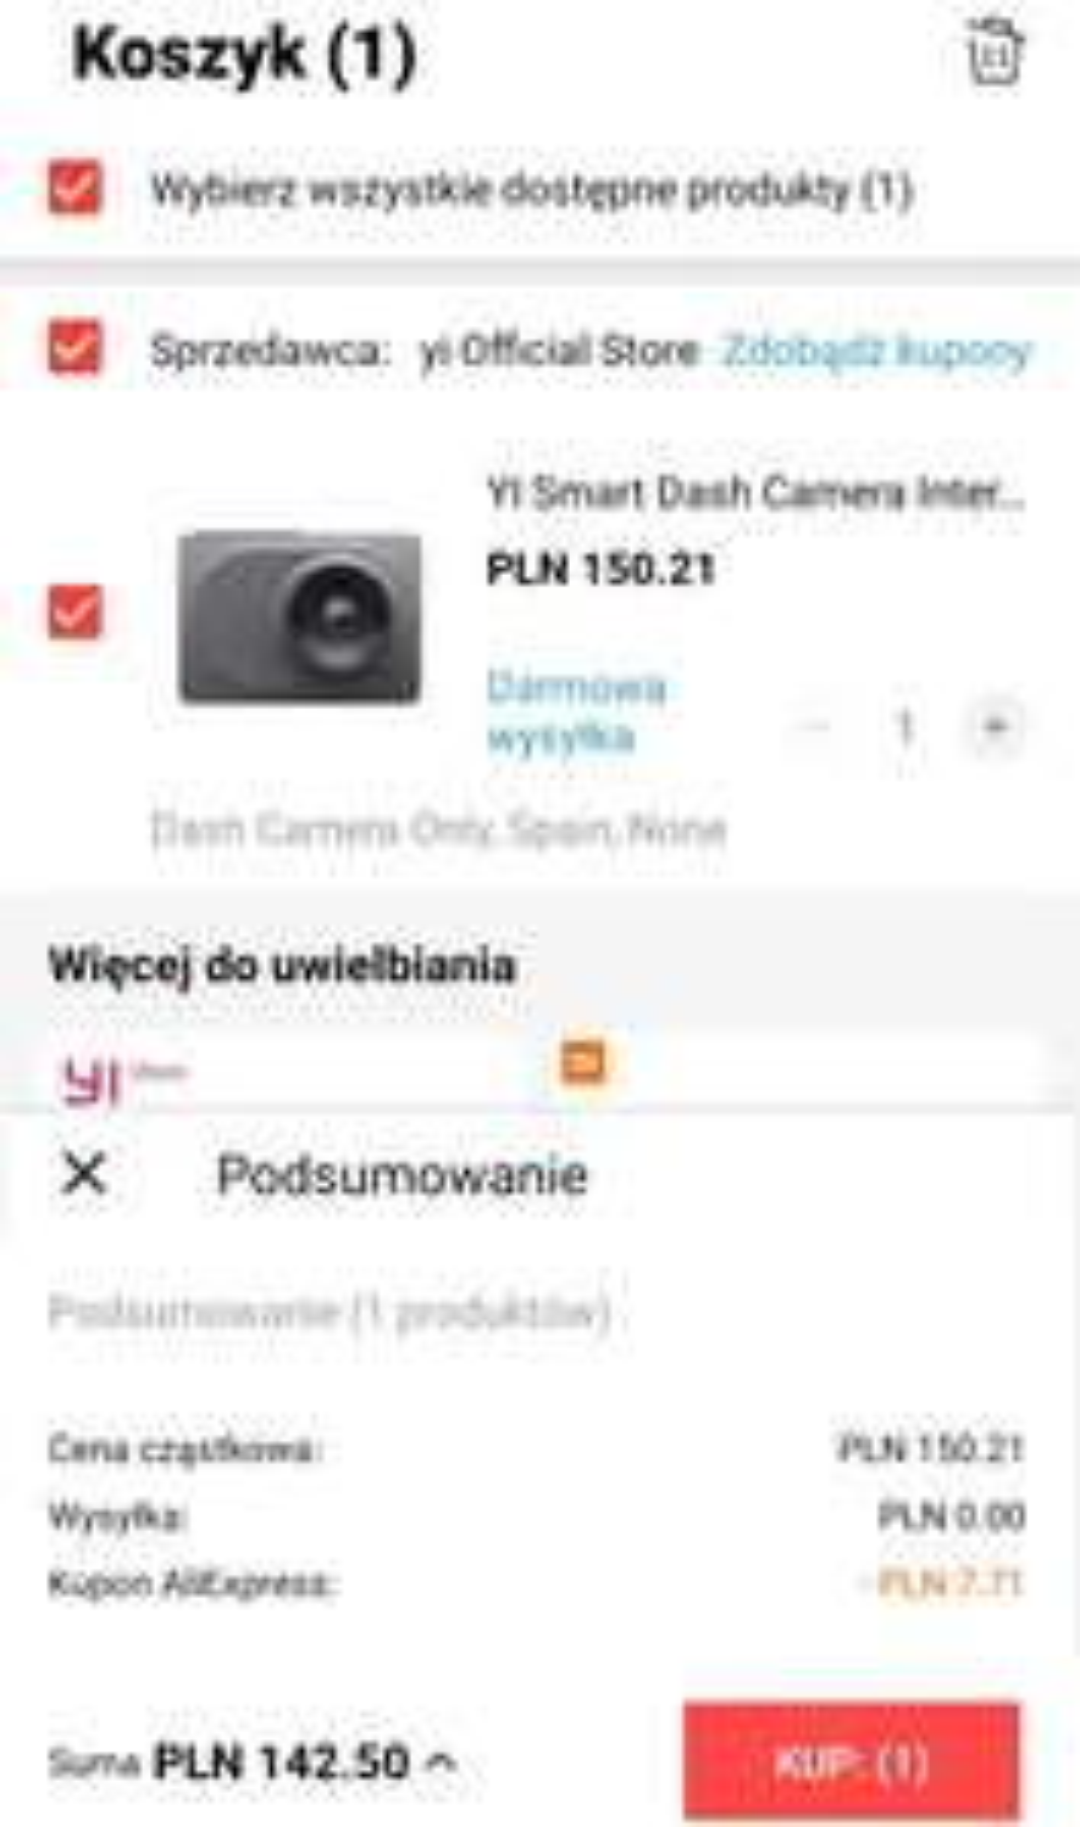 Yi Smart Dash Camera